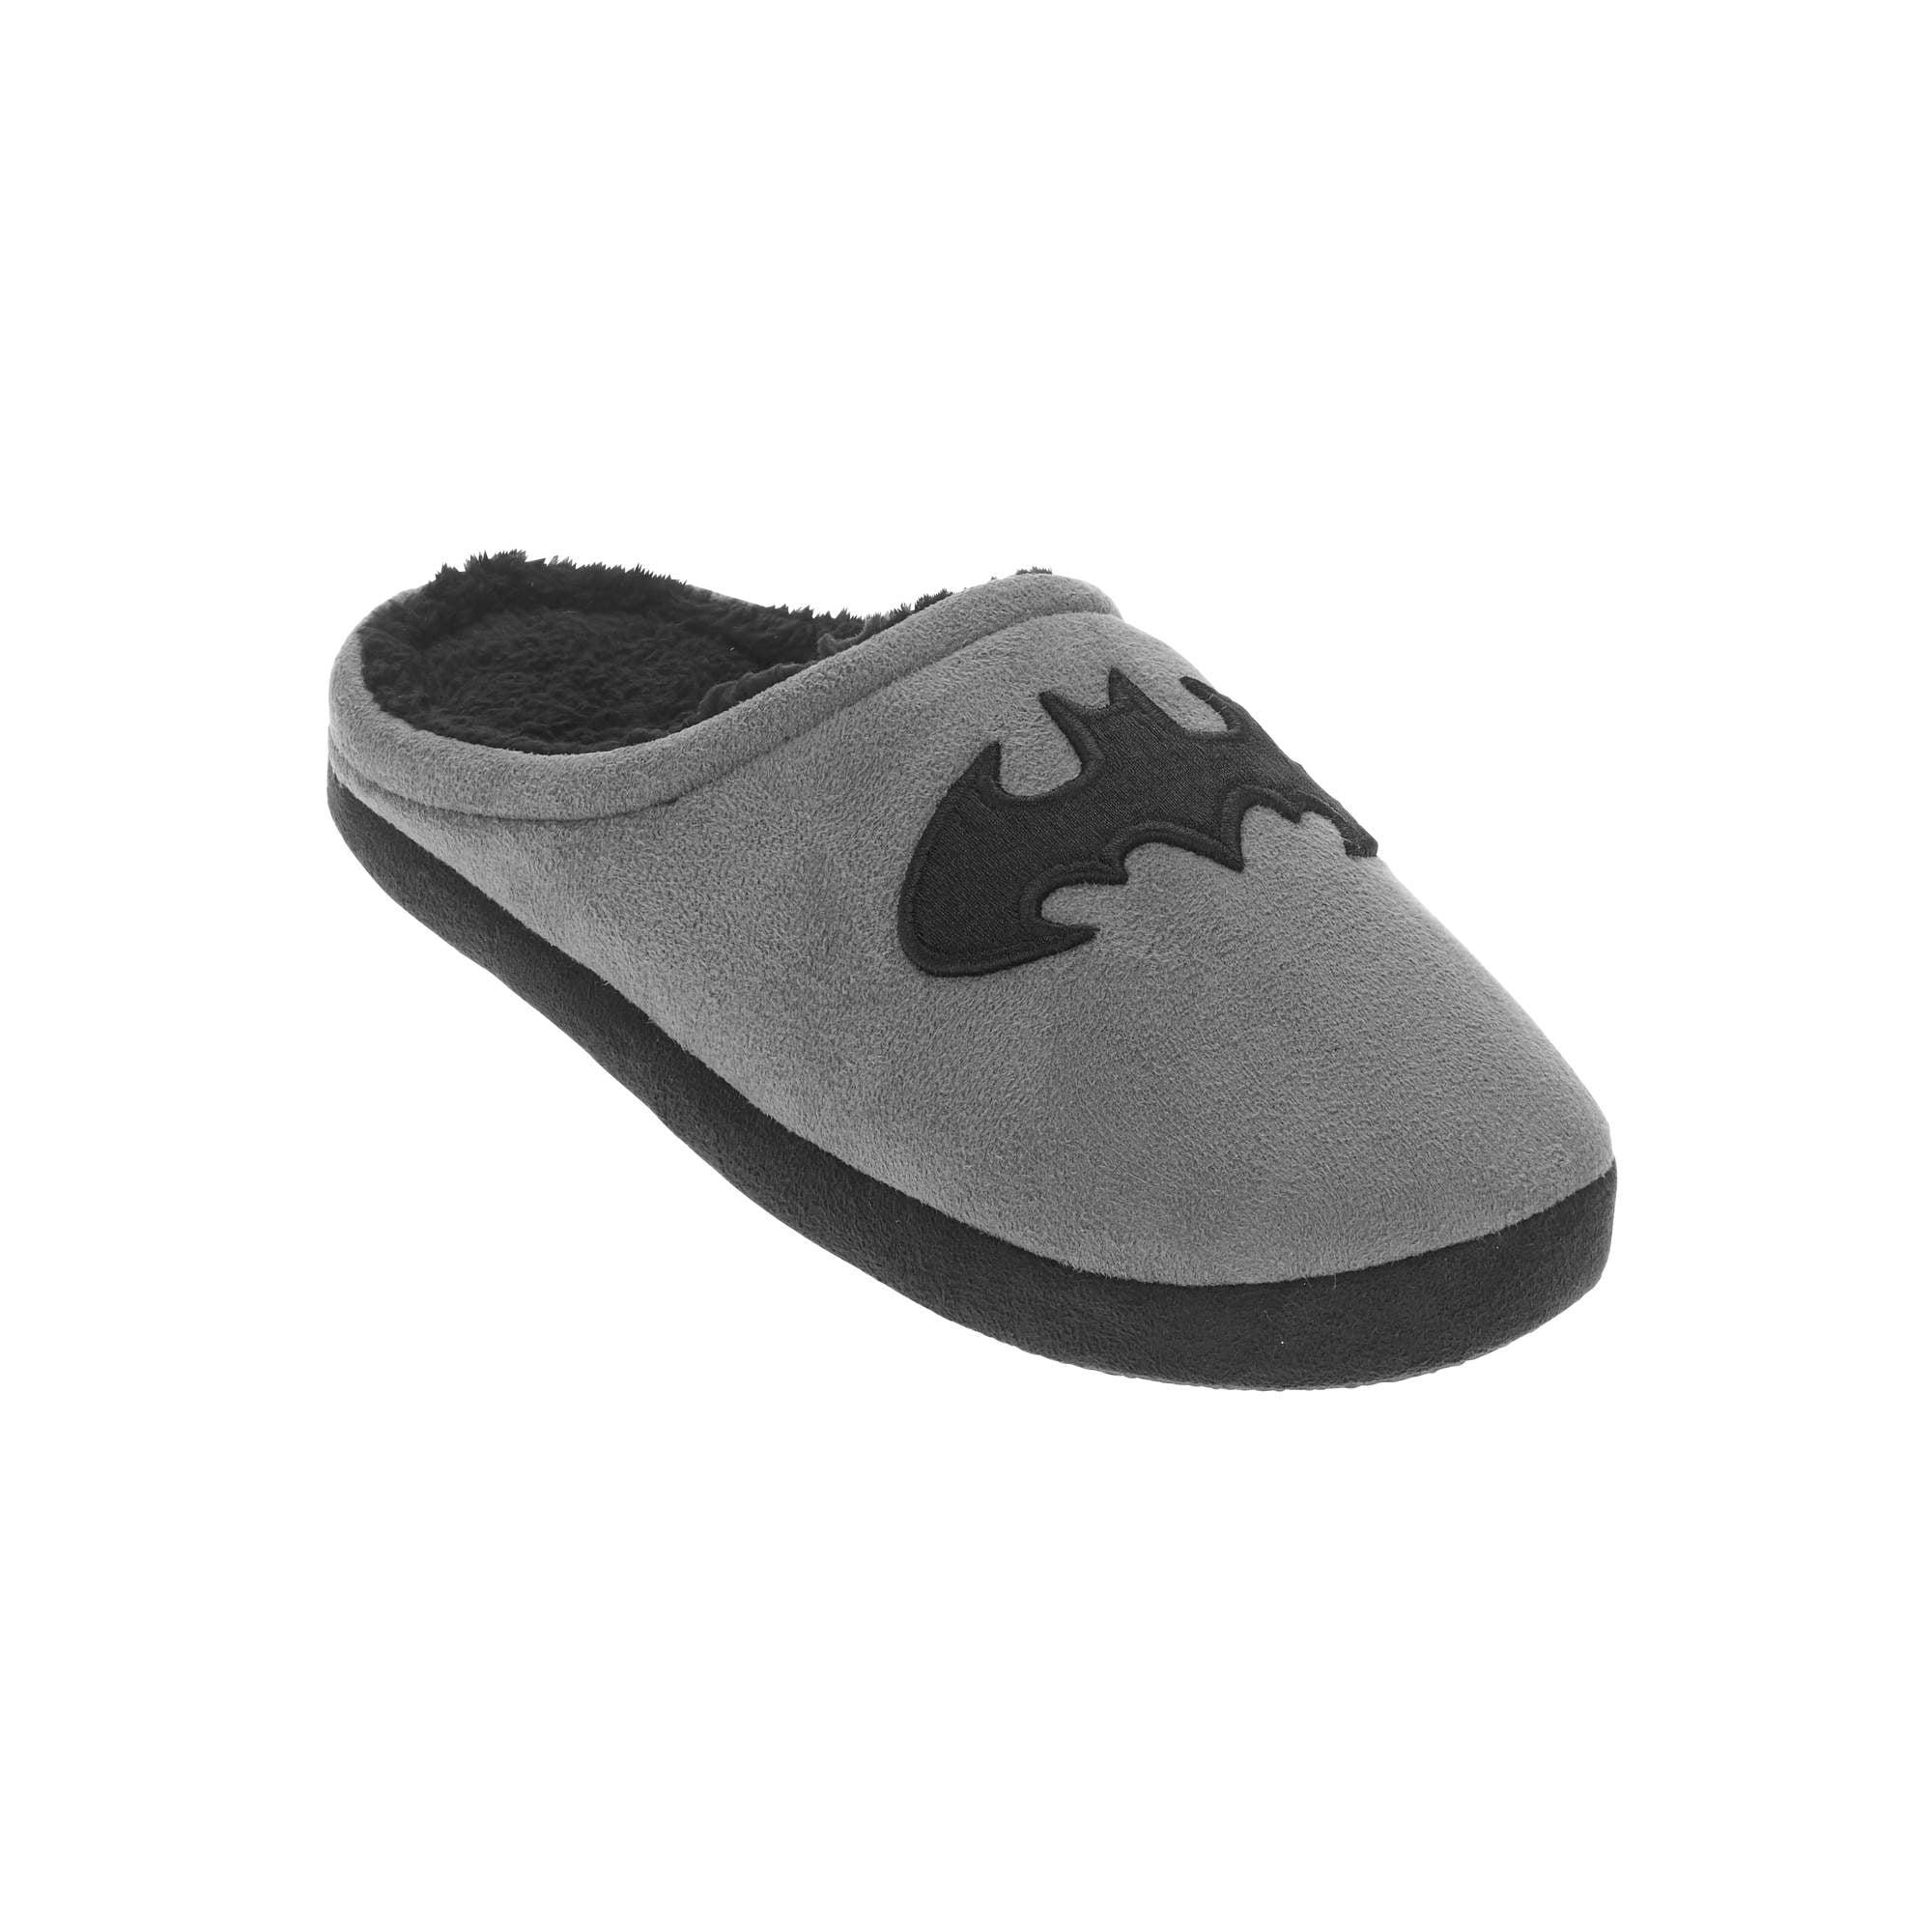 Men's Batman Slip-On Slipper by Generic